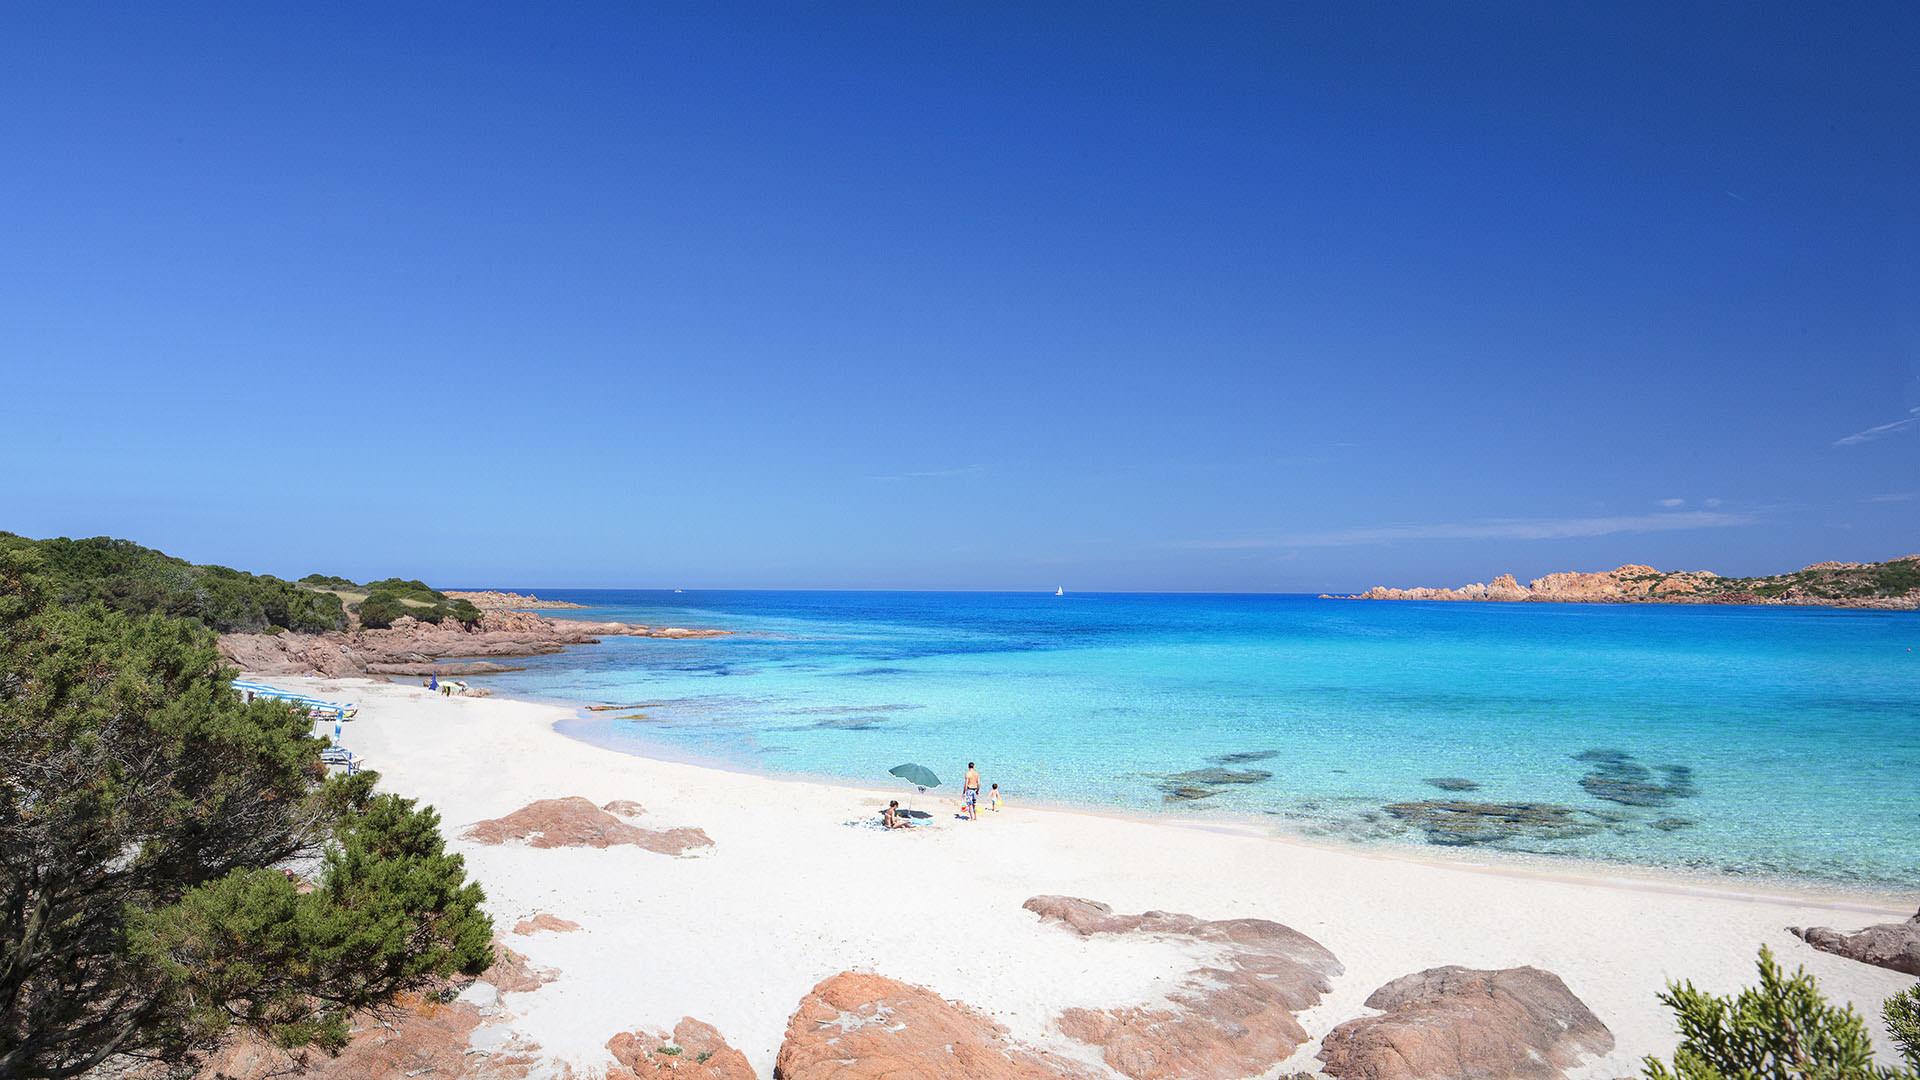 spiaggia-francesi-isola-rossa